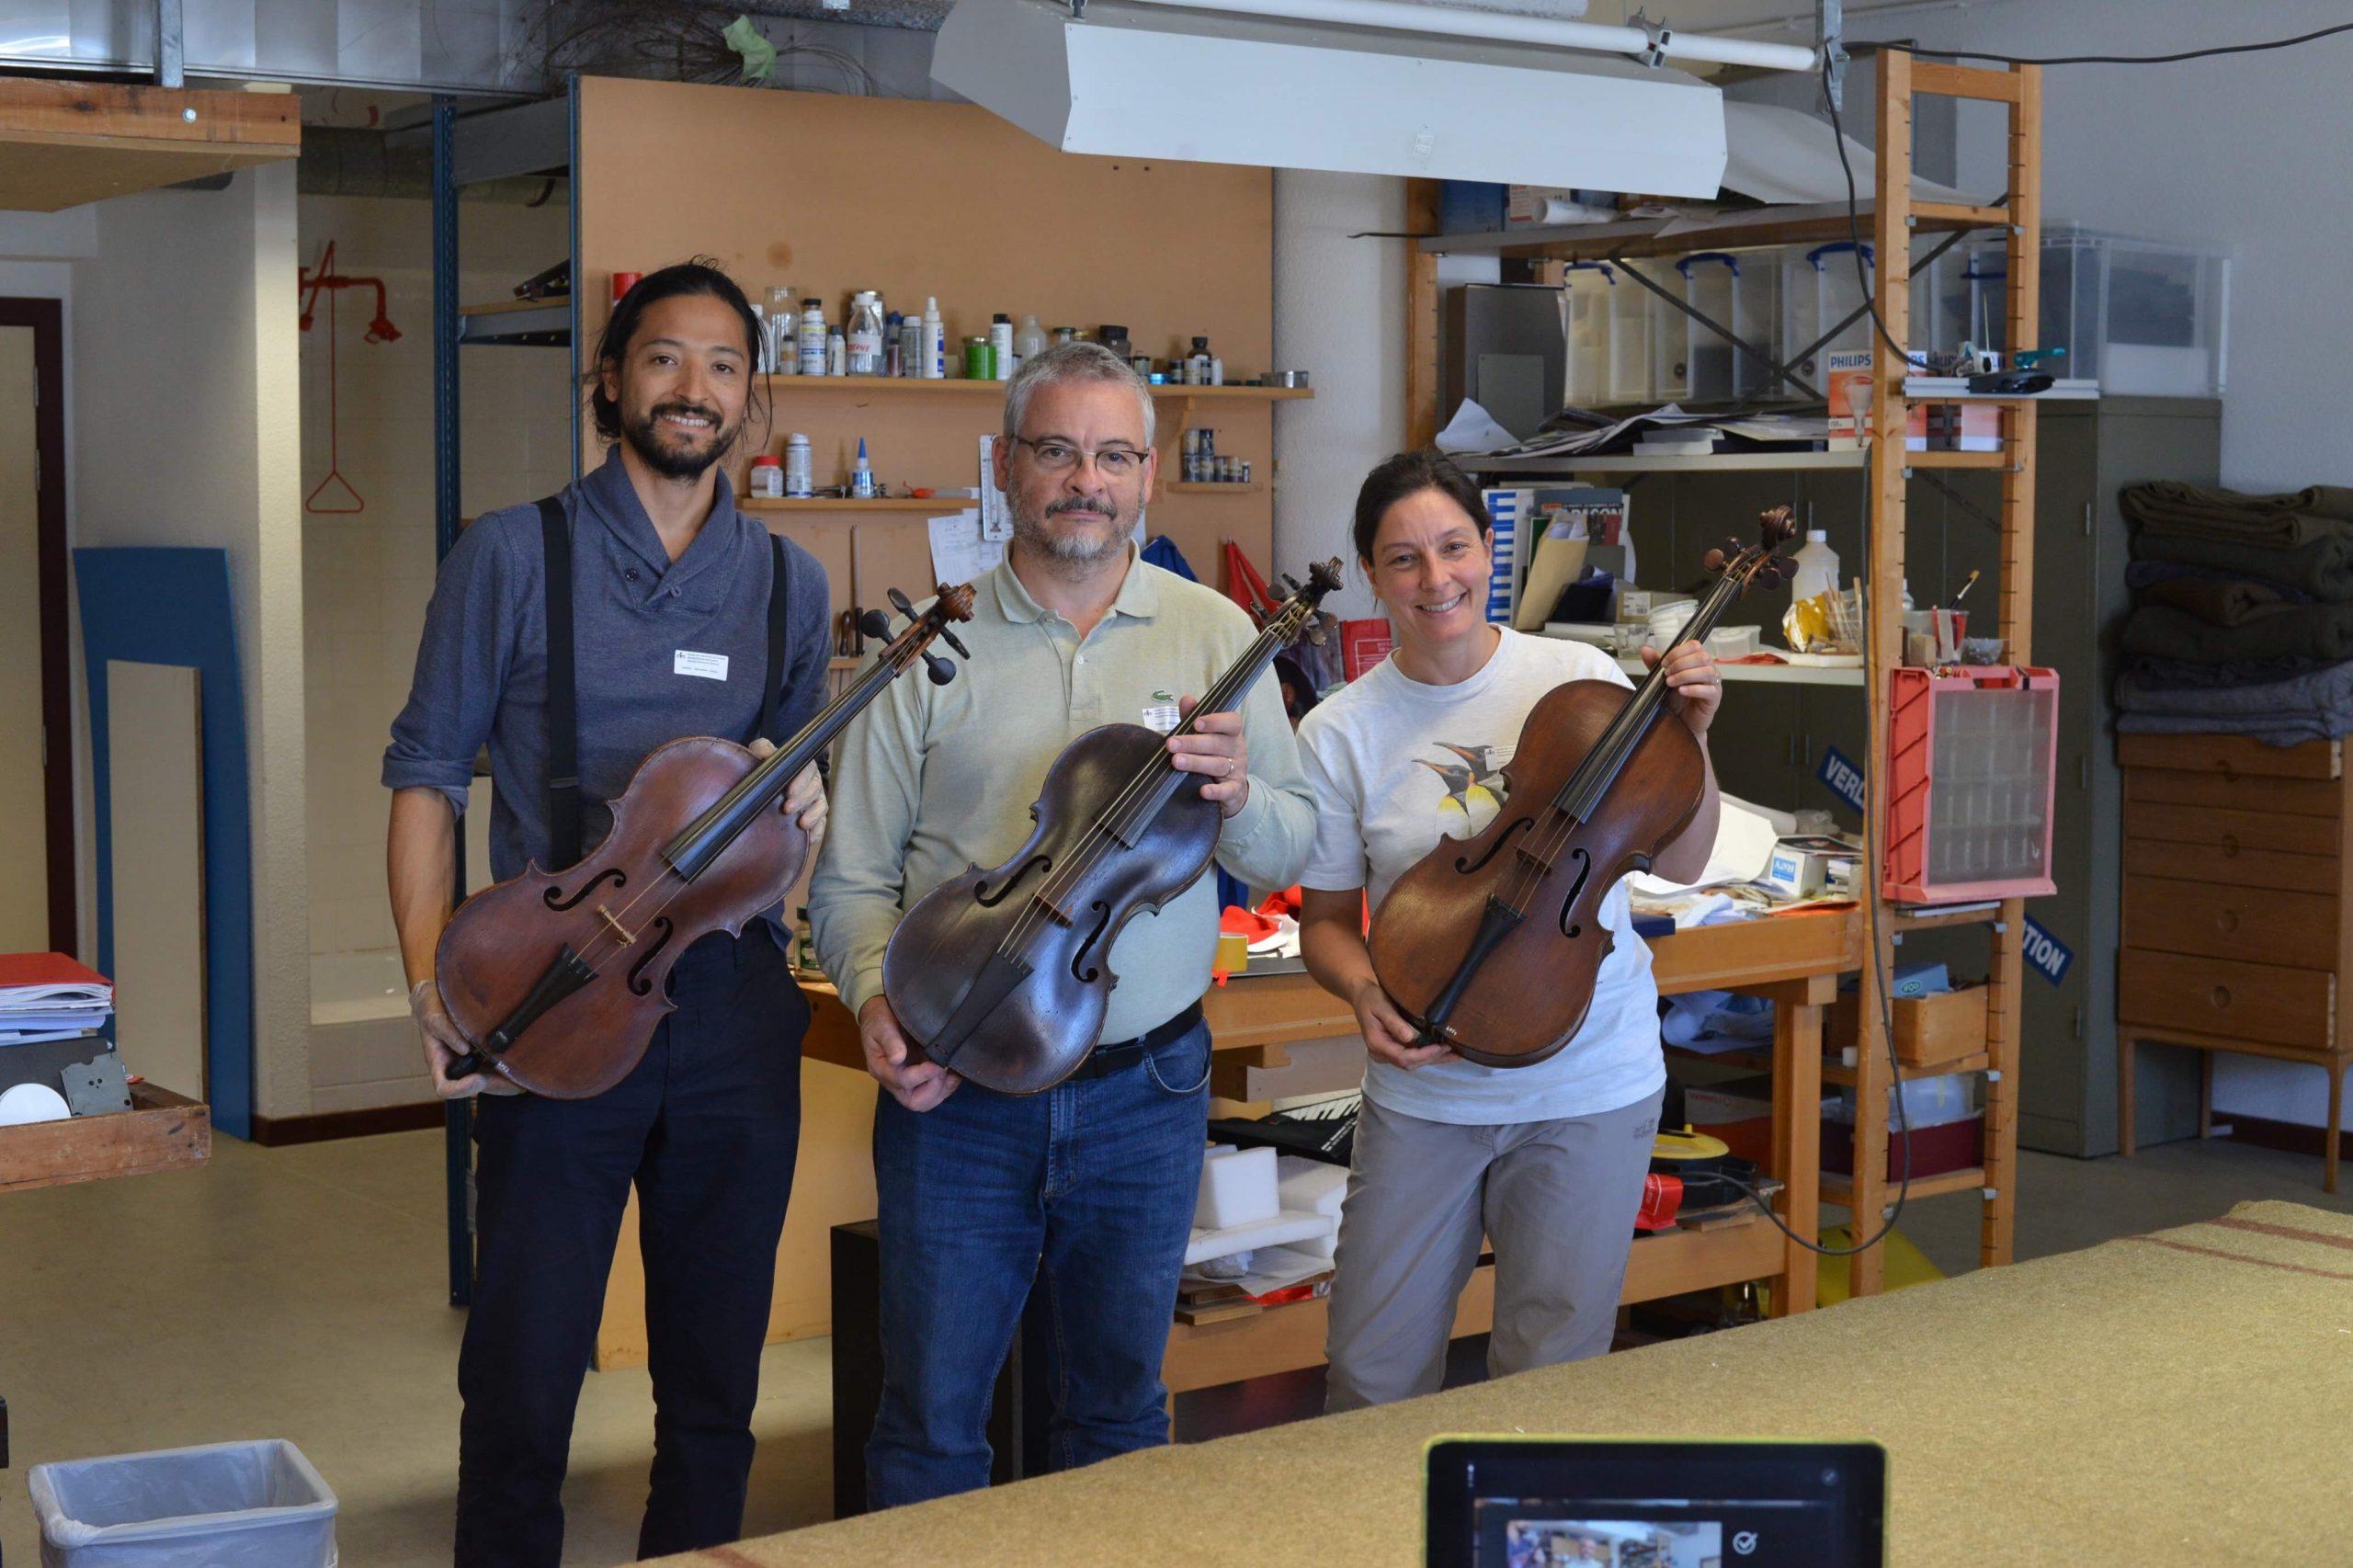 violoncello piccolo cinque corde Hoffmann Bruxelles visintini gaidano